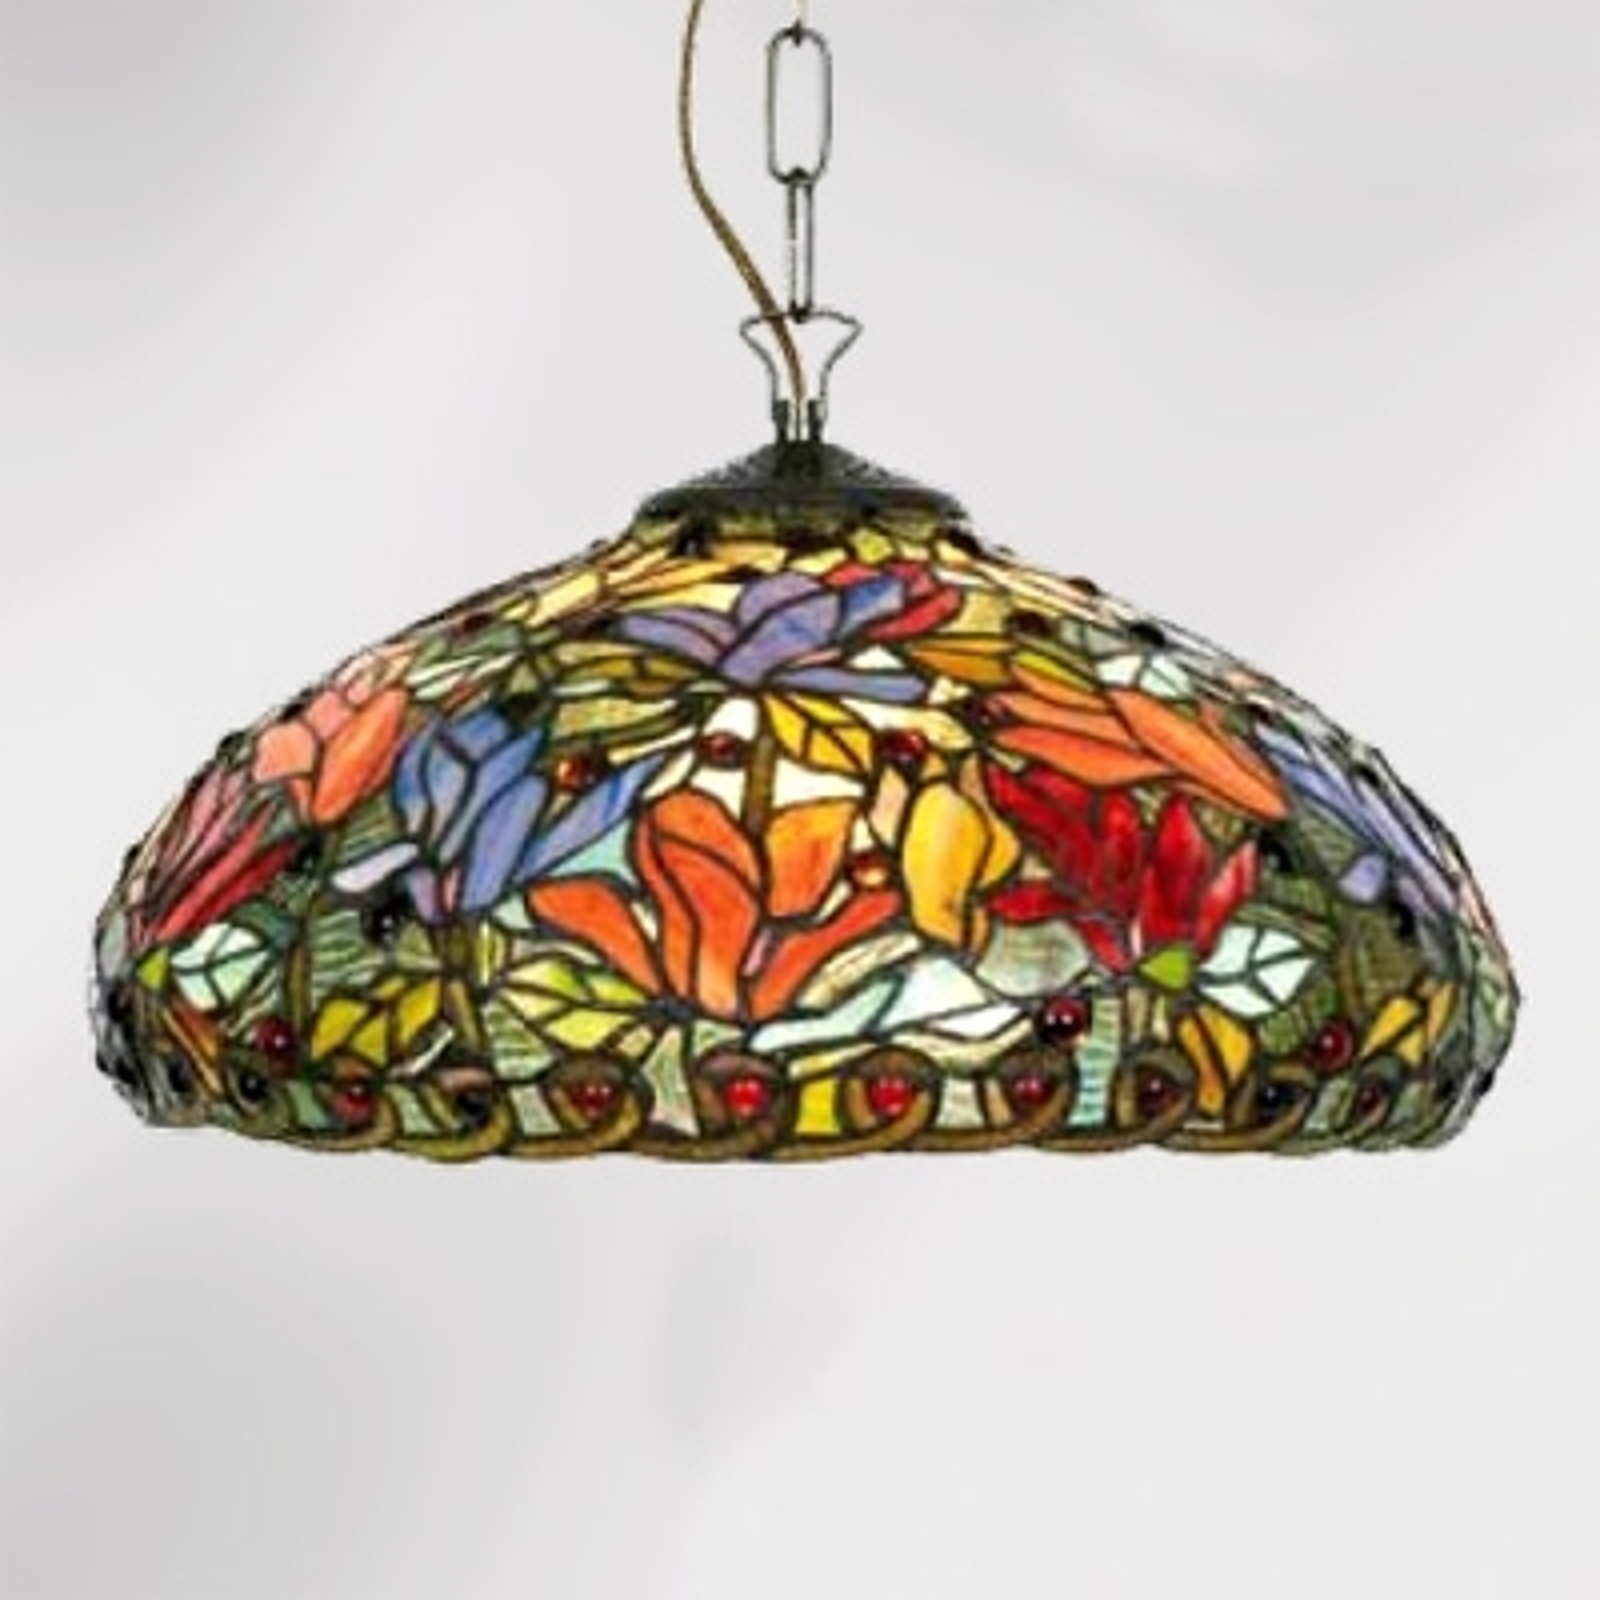 Floral hanging light Elaine, Tiffany-style, 1-bulb_1032251_1